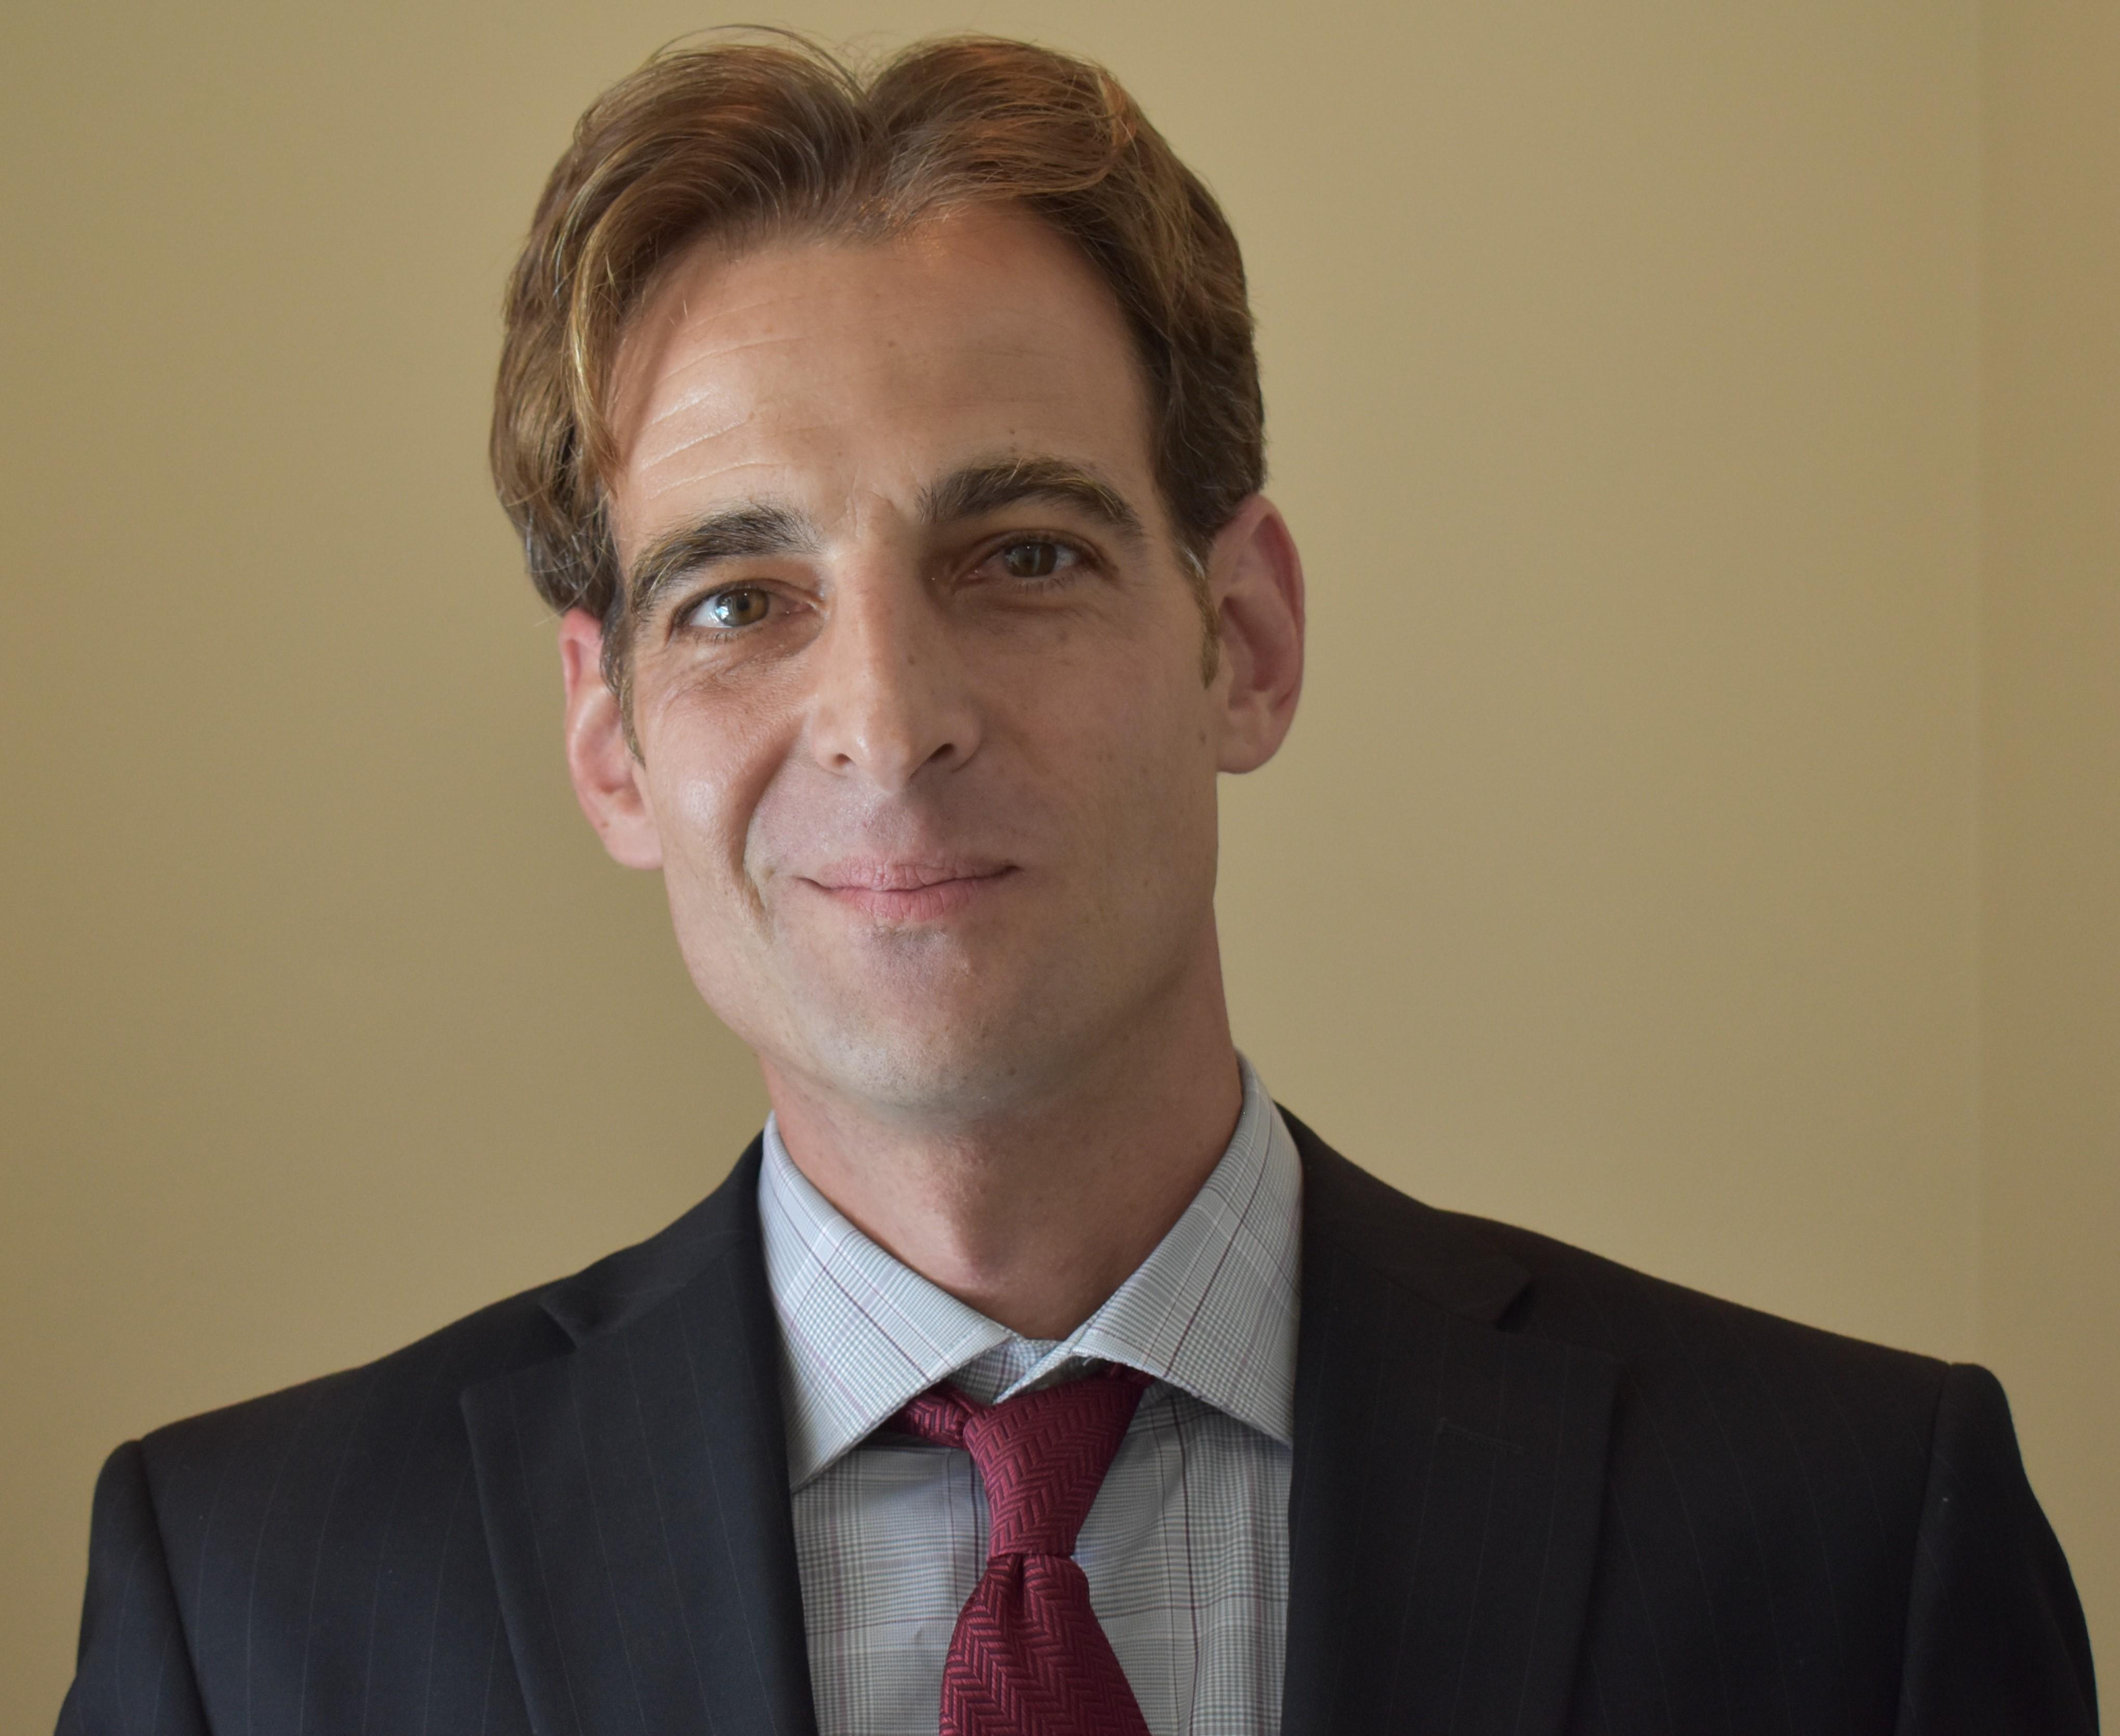 COREY LOUIS SOKOLOW  Insurance Agent